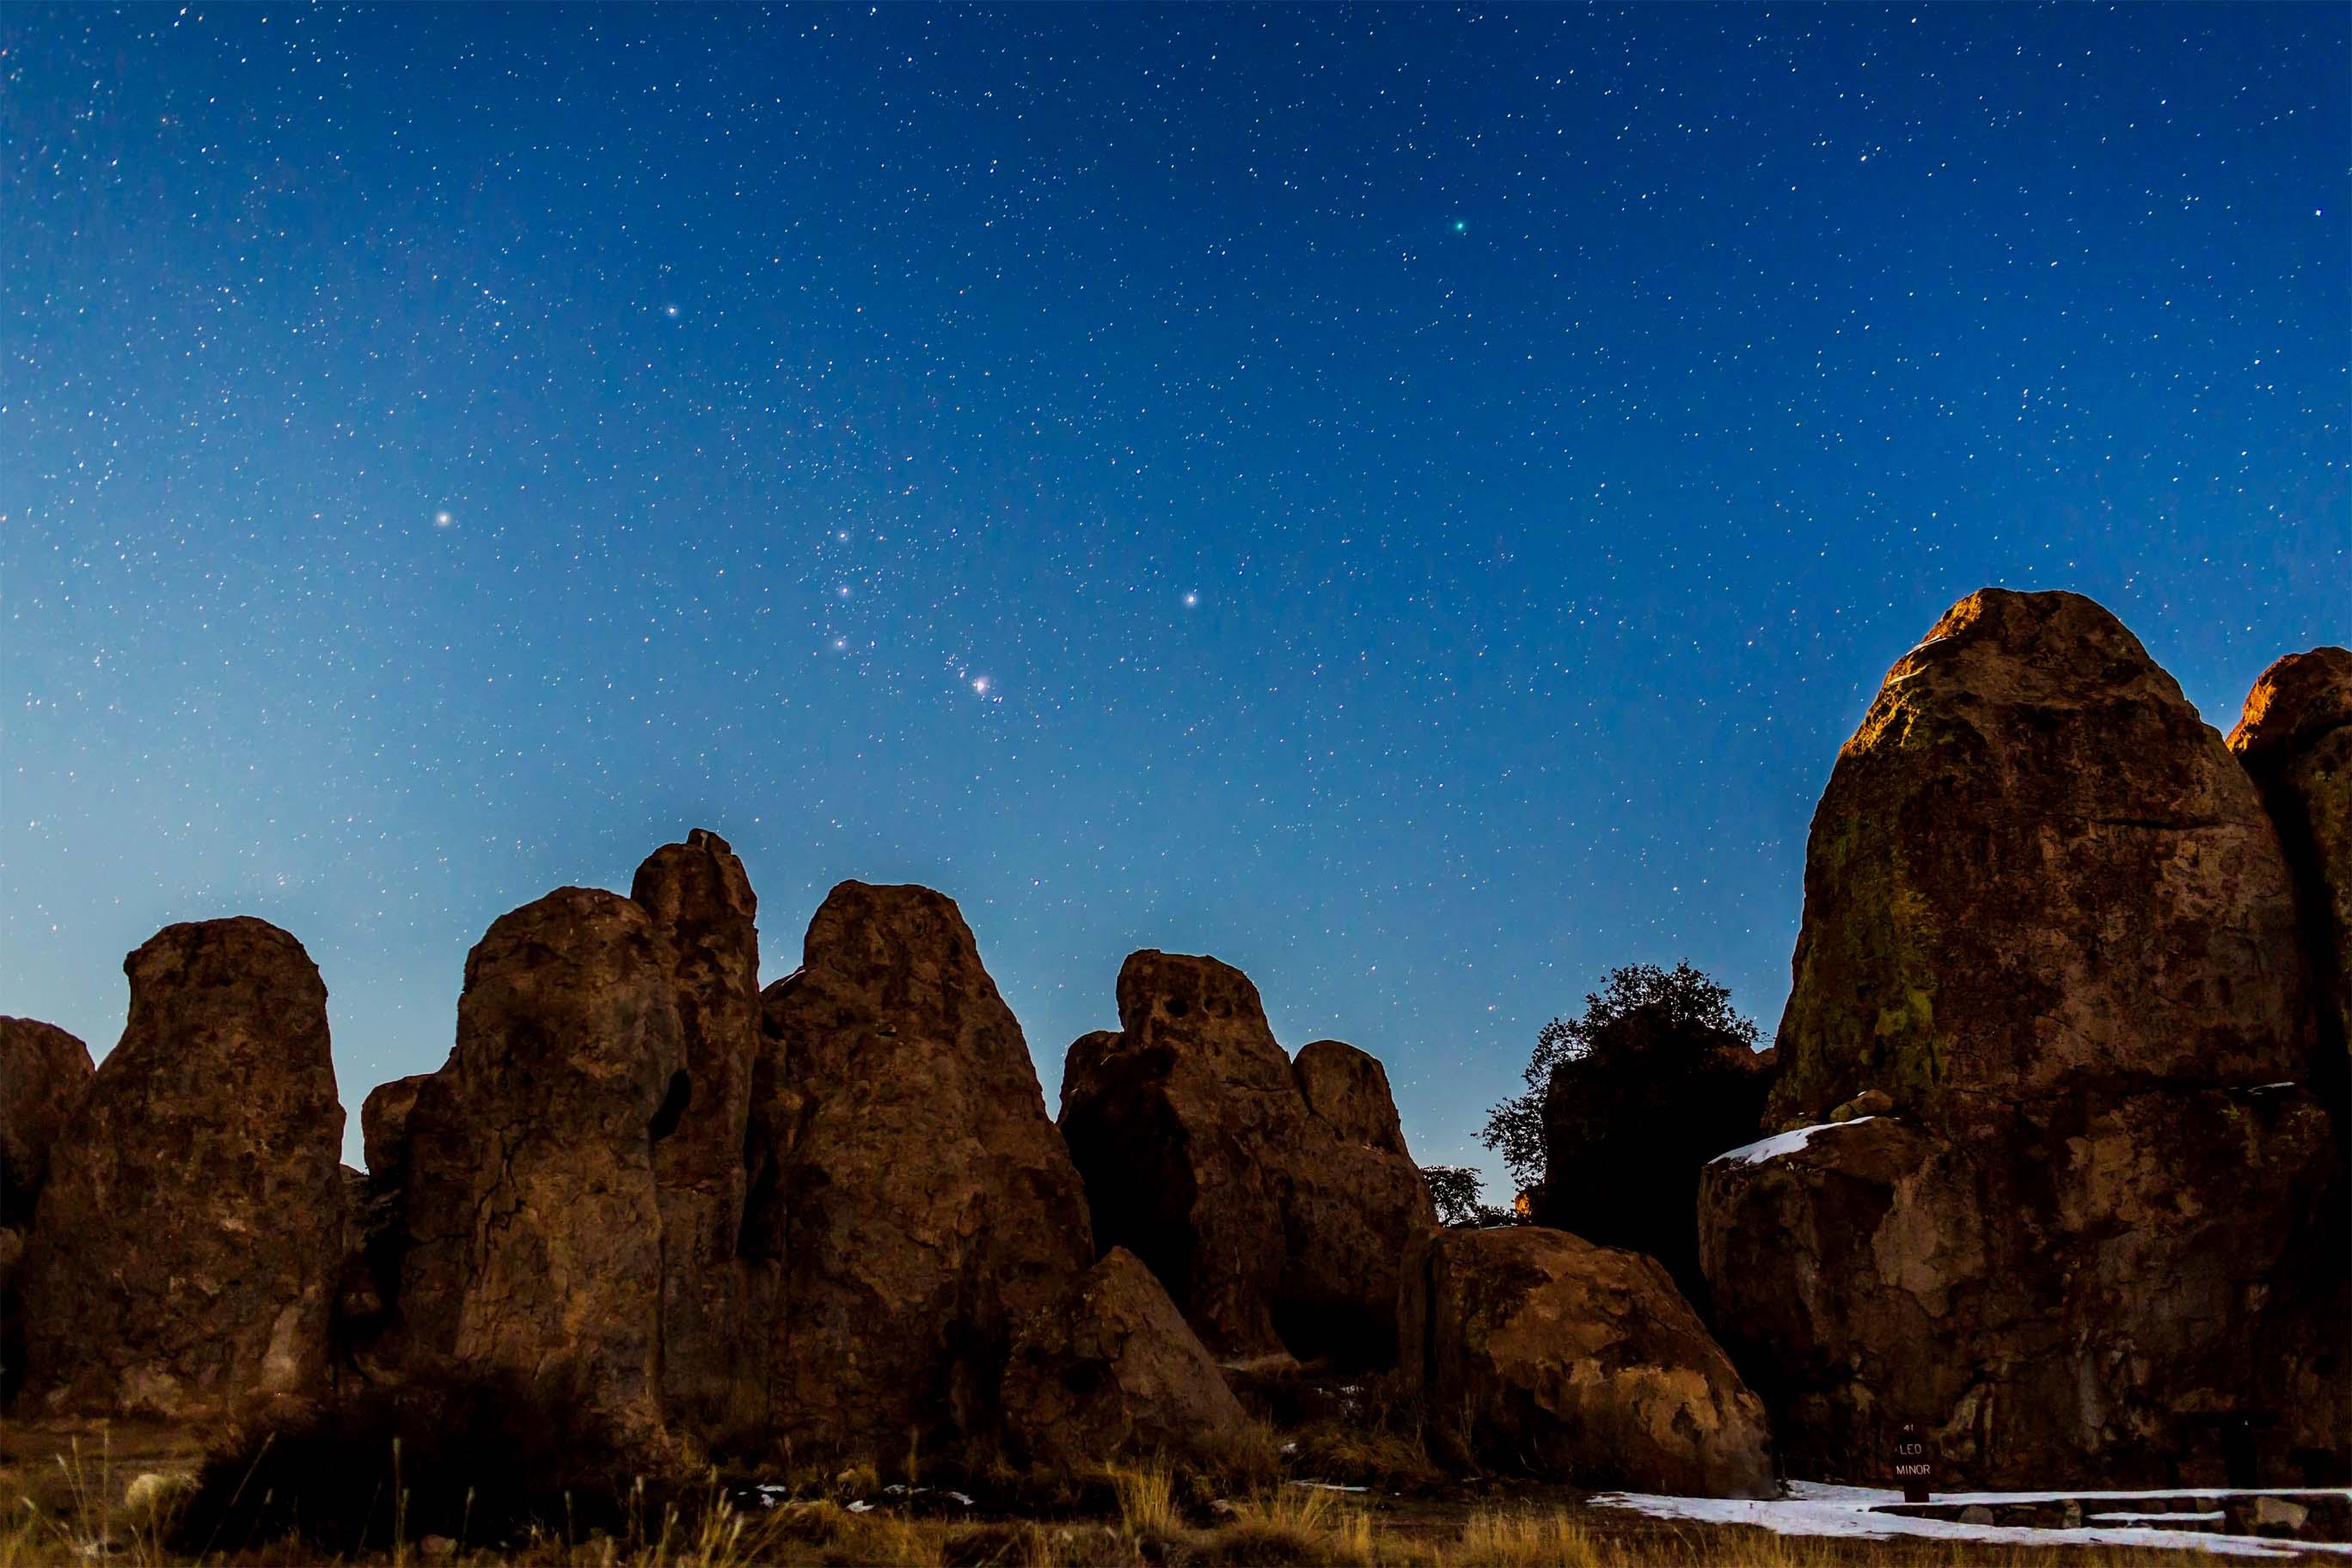 Comet Lovejoy near Orion